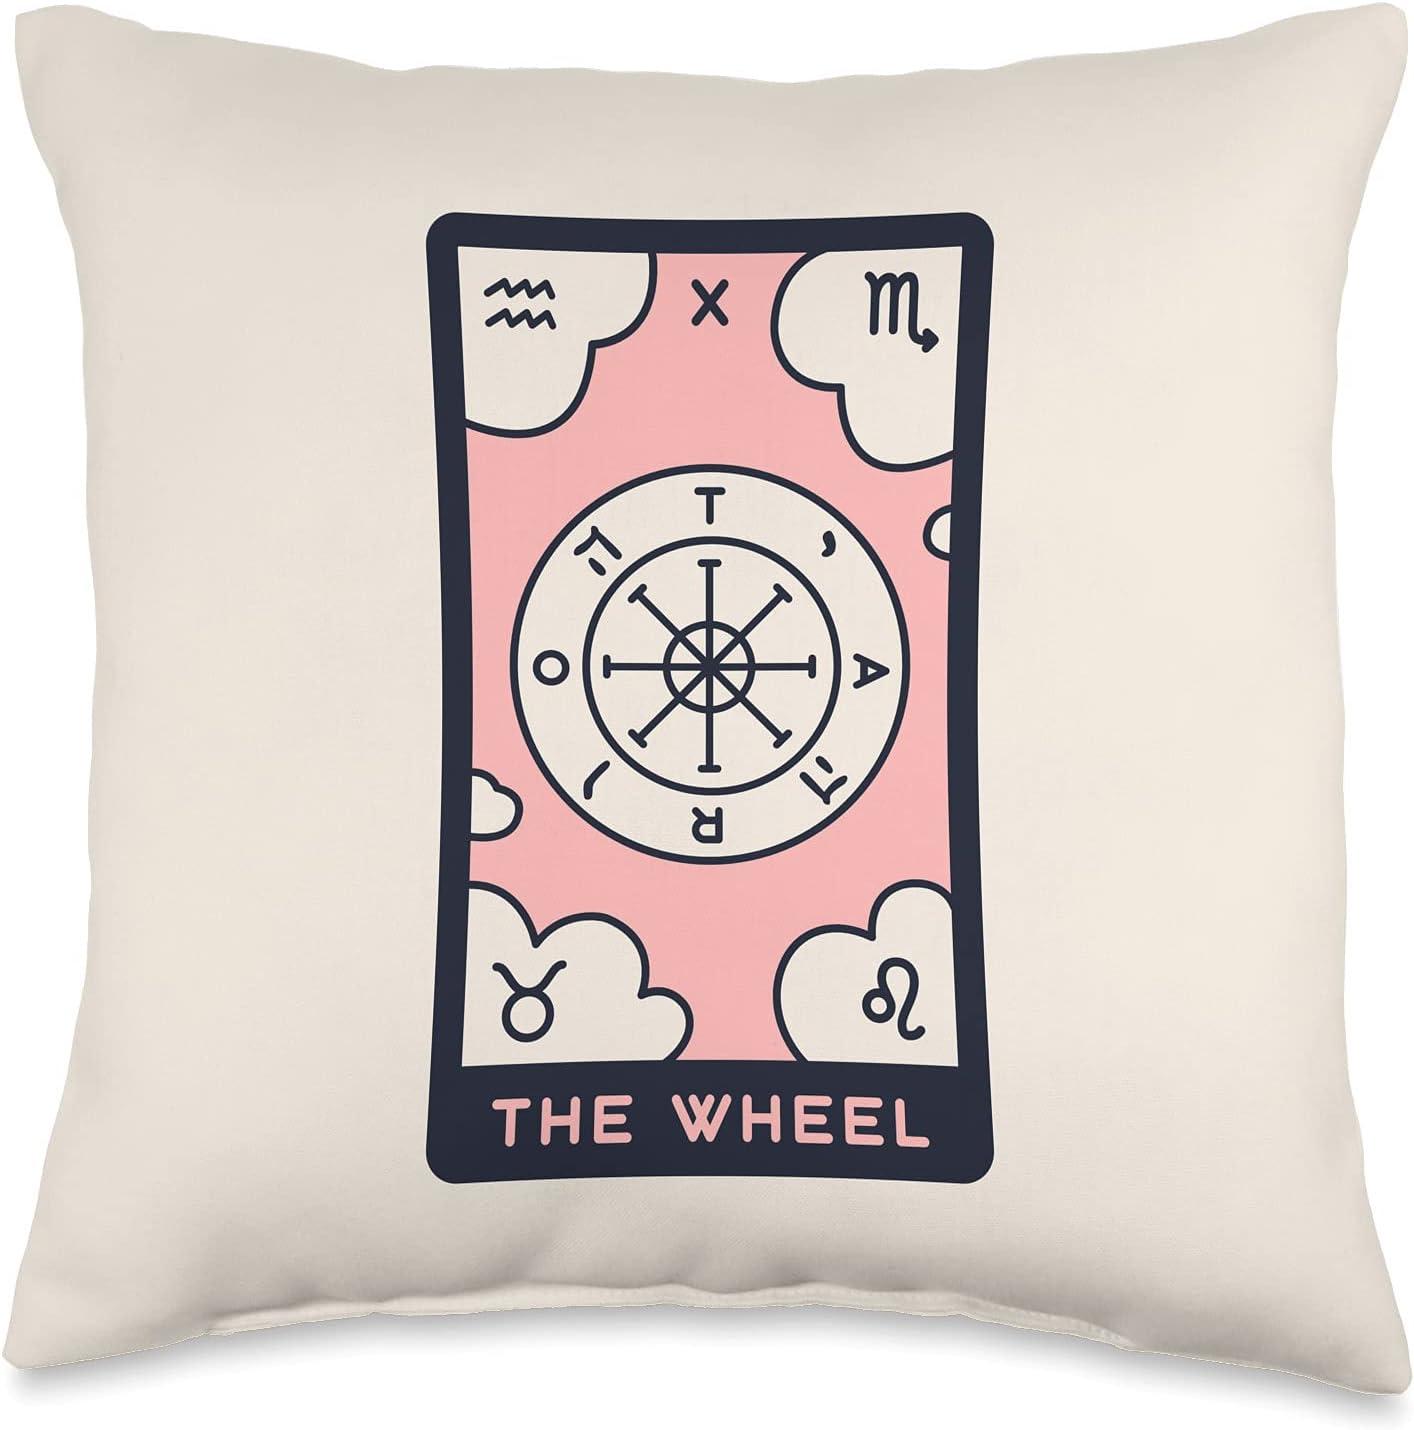 Tarot Ranking TOP11 Designs Accessories Card The Wheel Pillow 1 Throw